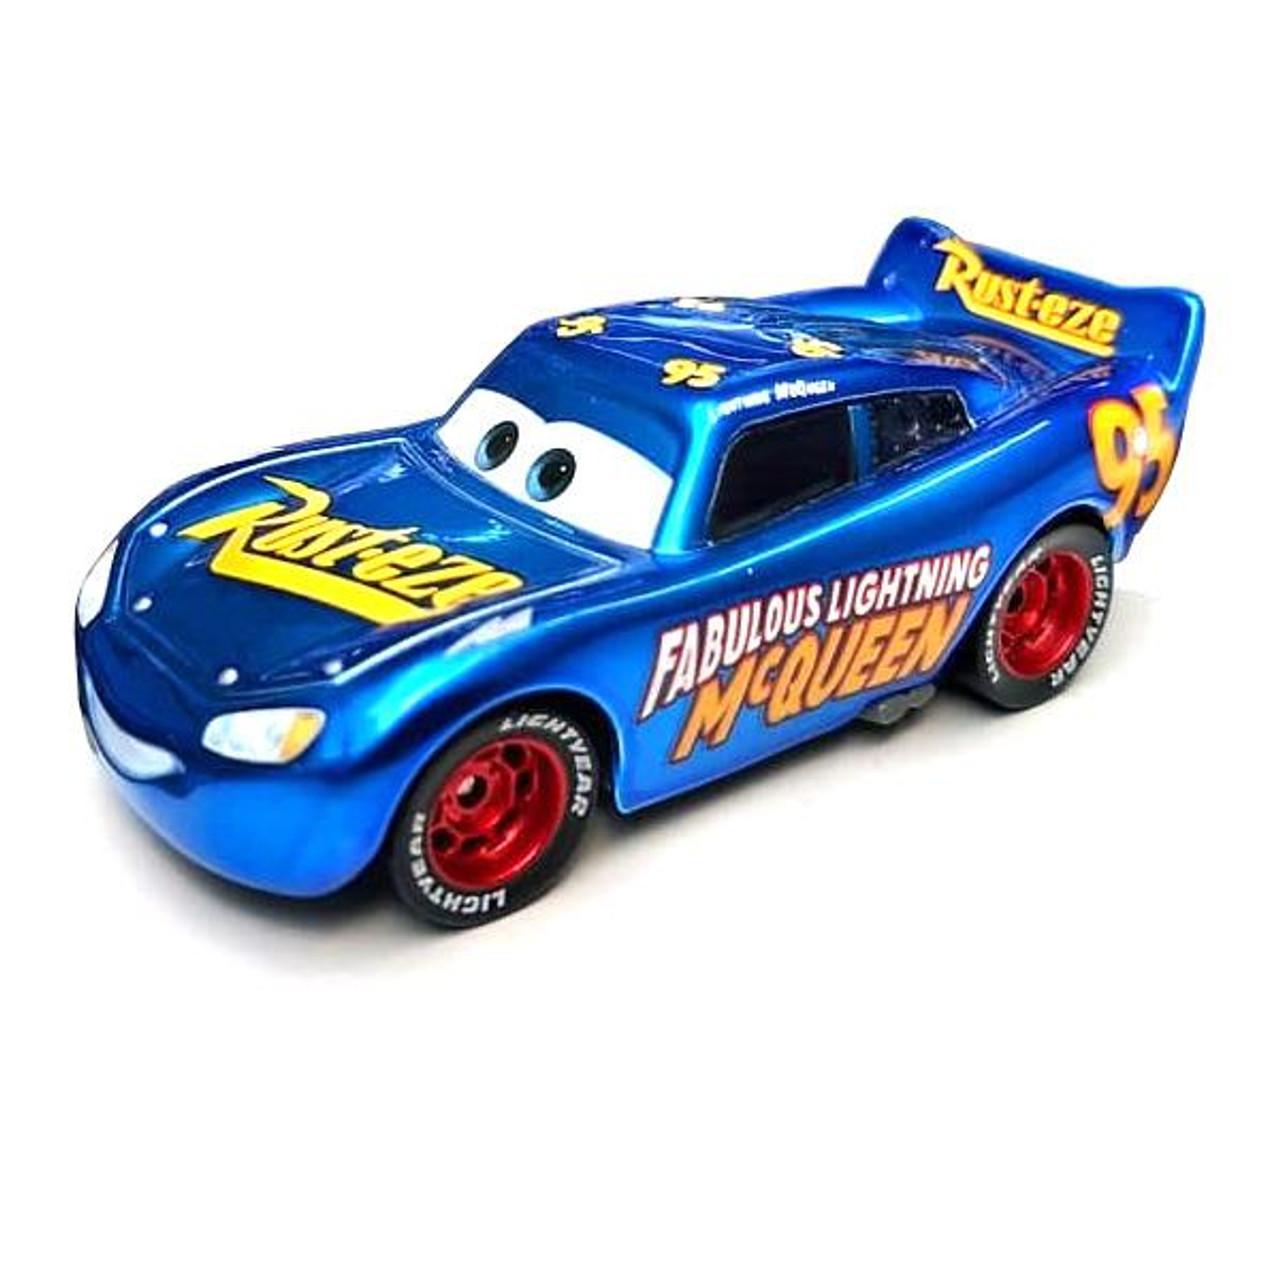 "DISNEY PIXAR CARS 3 /""FABULOUS LIGHTNING MCQUEEN THOMASVILLE RACING LEGENDS/"""